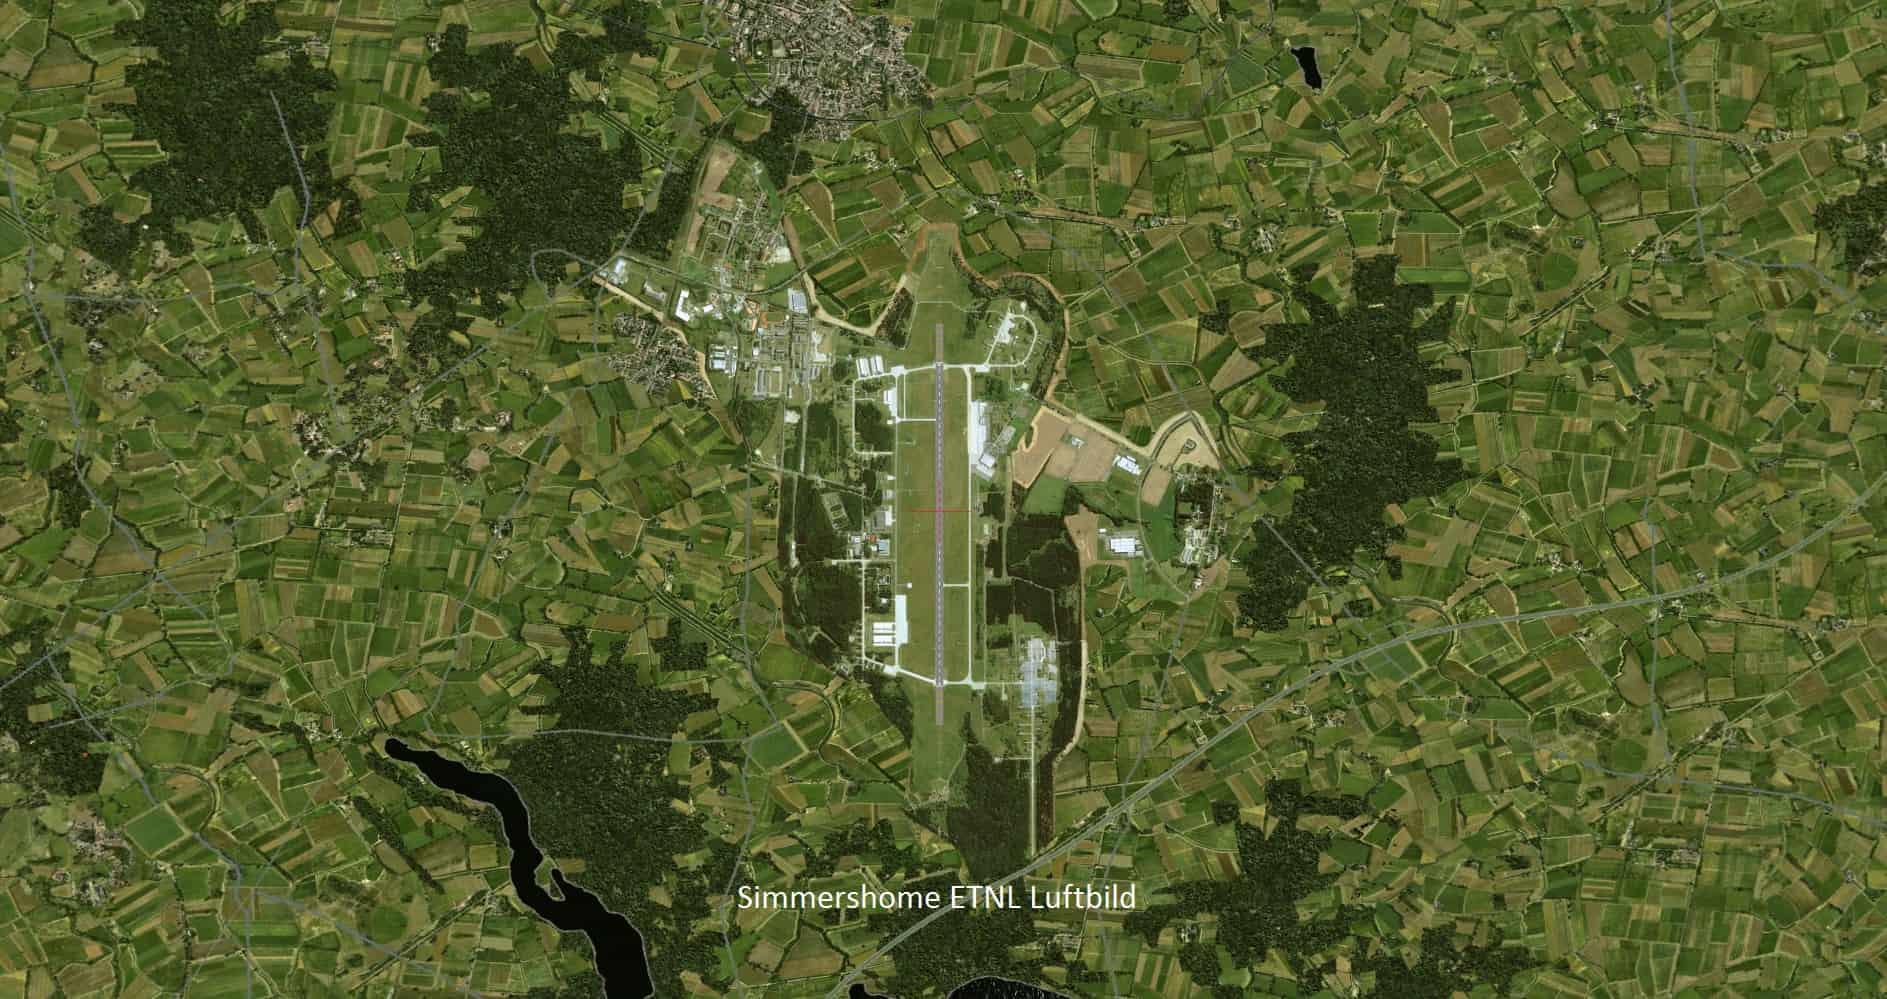 ETNL Luftbild